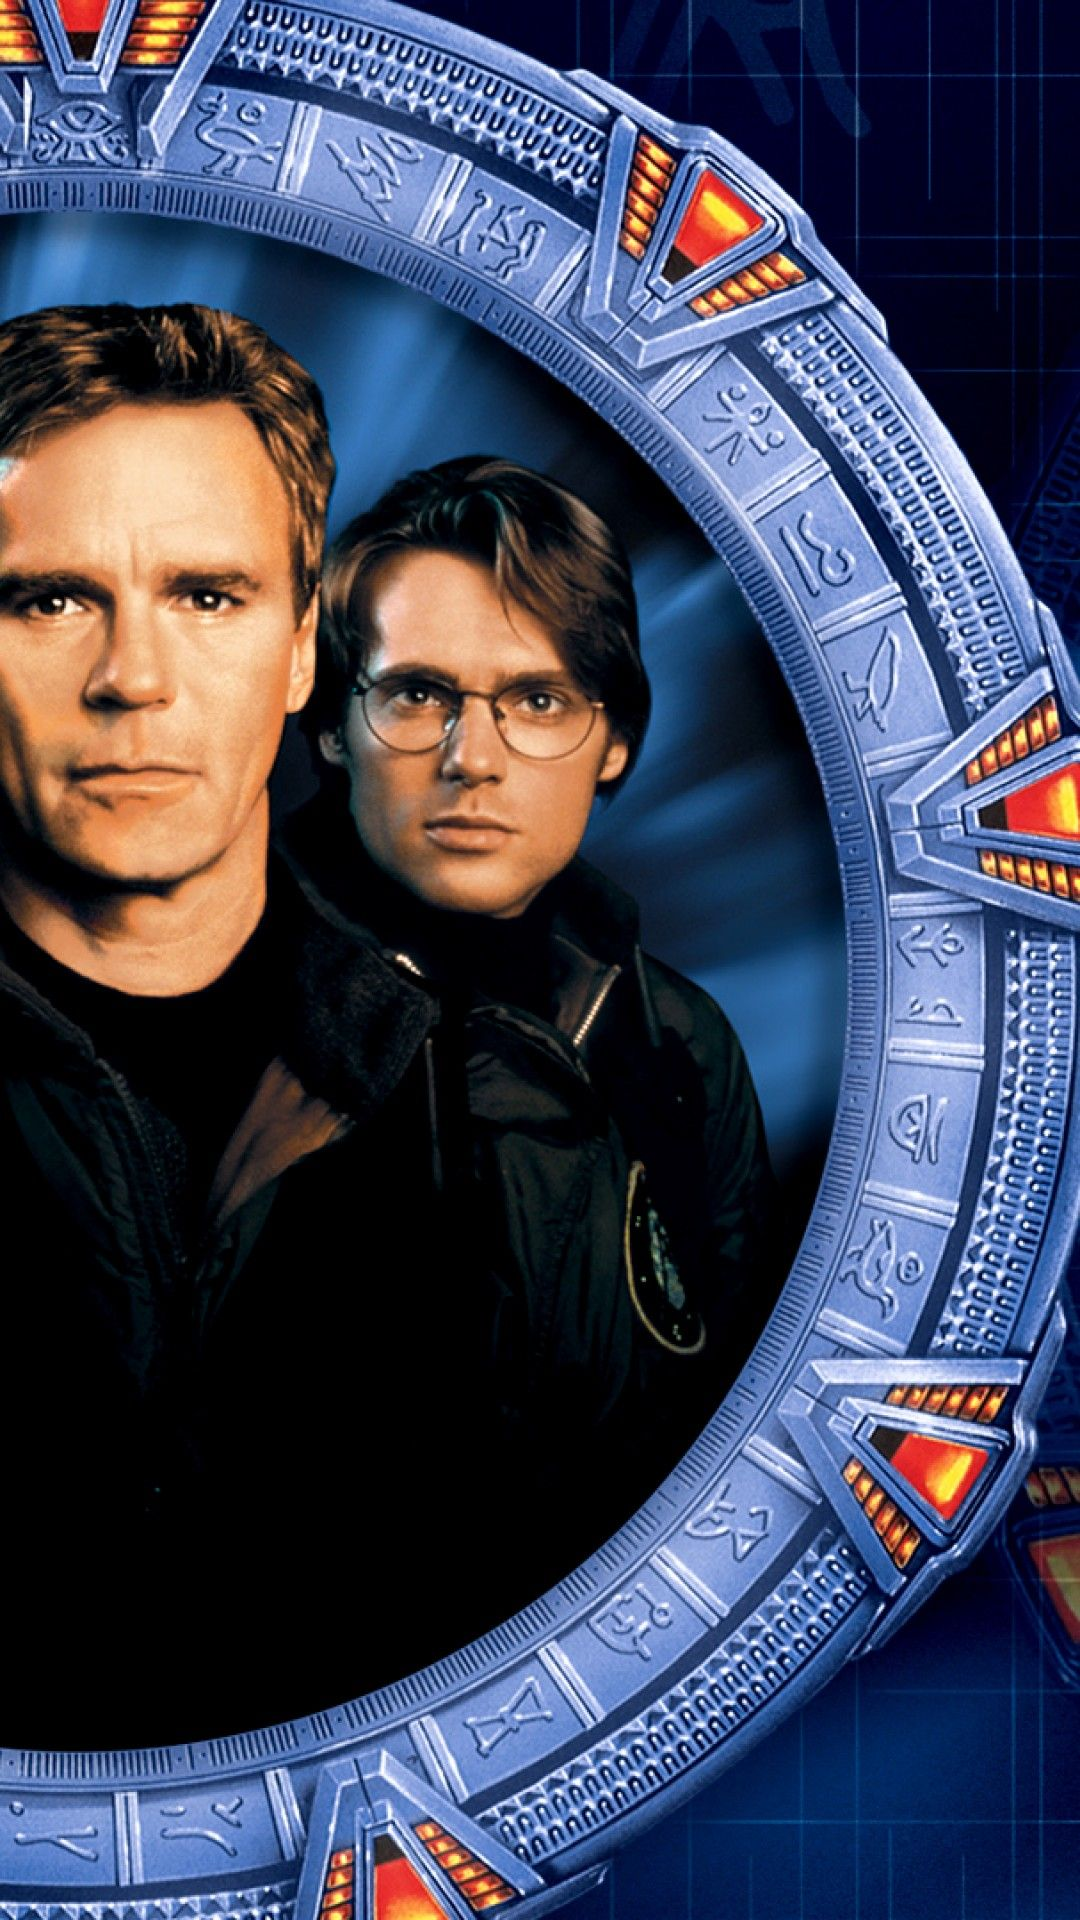 HD Stargate sg1 Mobile Phone Wallpaper 1080x1920